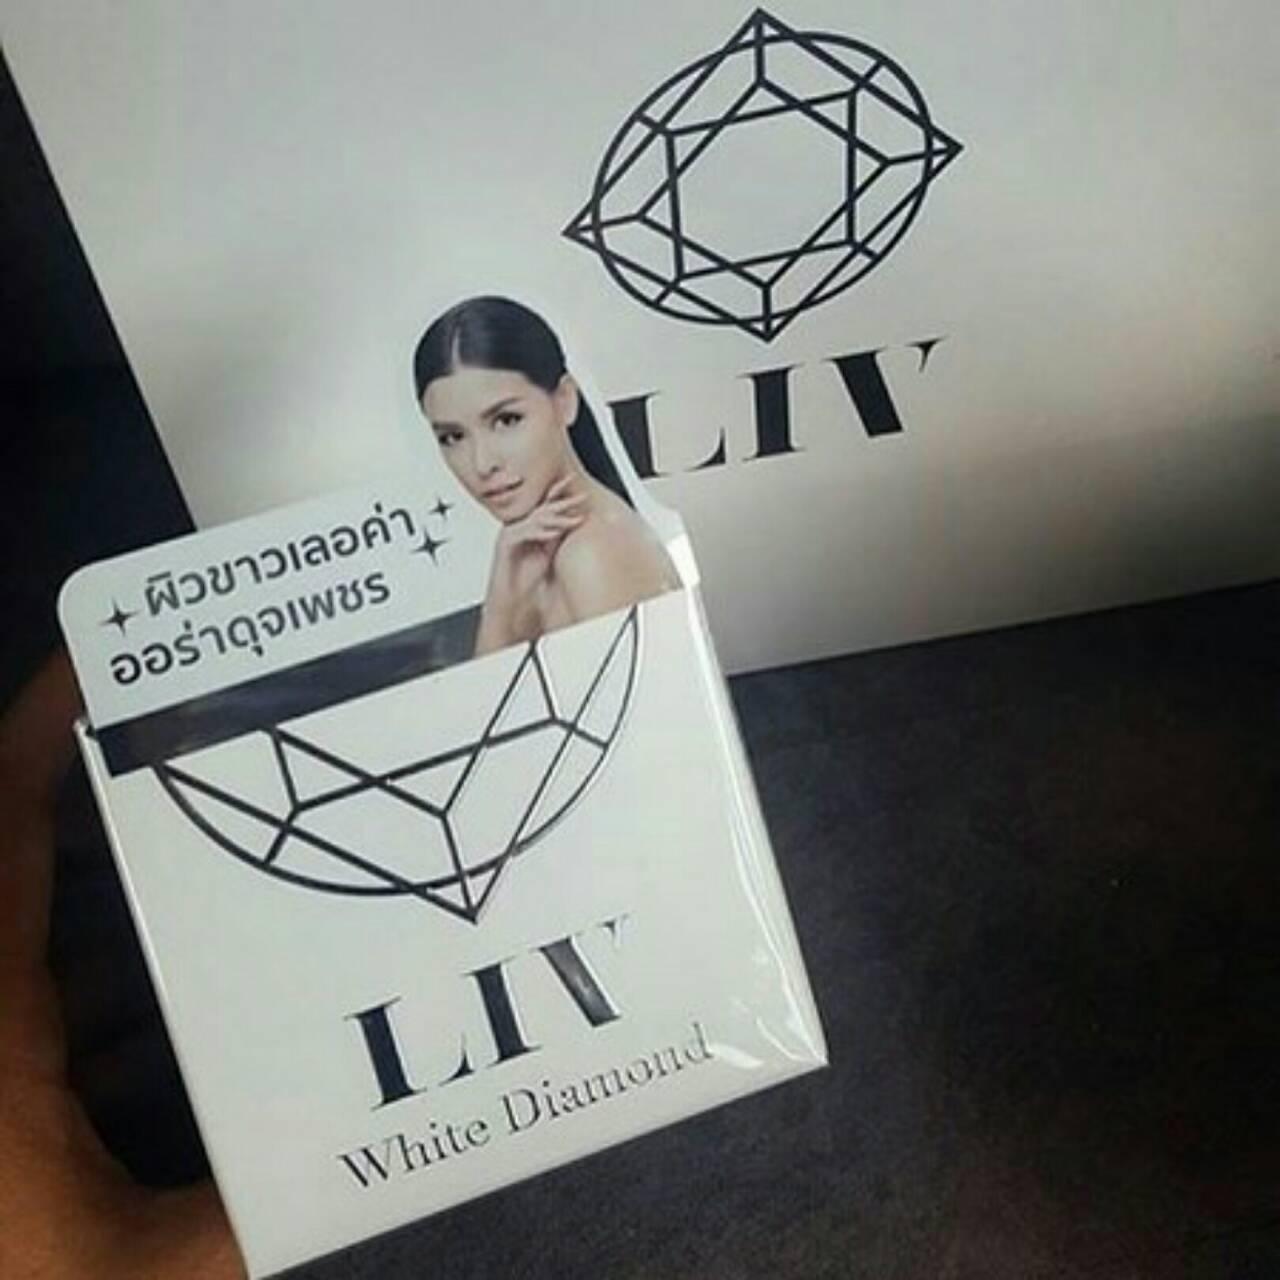 Liv White Diamond ลิฟ ไวท์ ไดมอนด์ ครีมวิกกี้ สวยเลอค่า ออร่าดุจเพชร